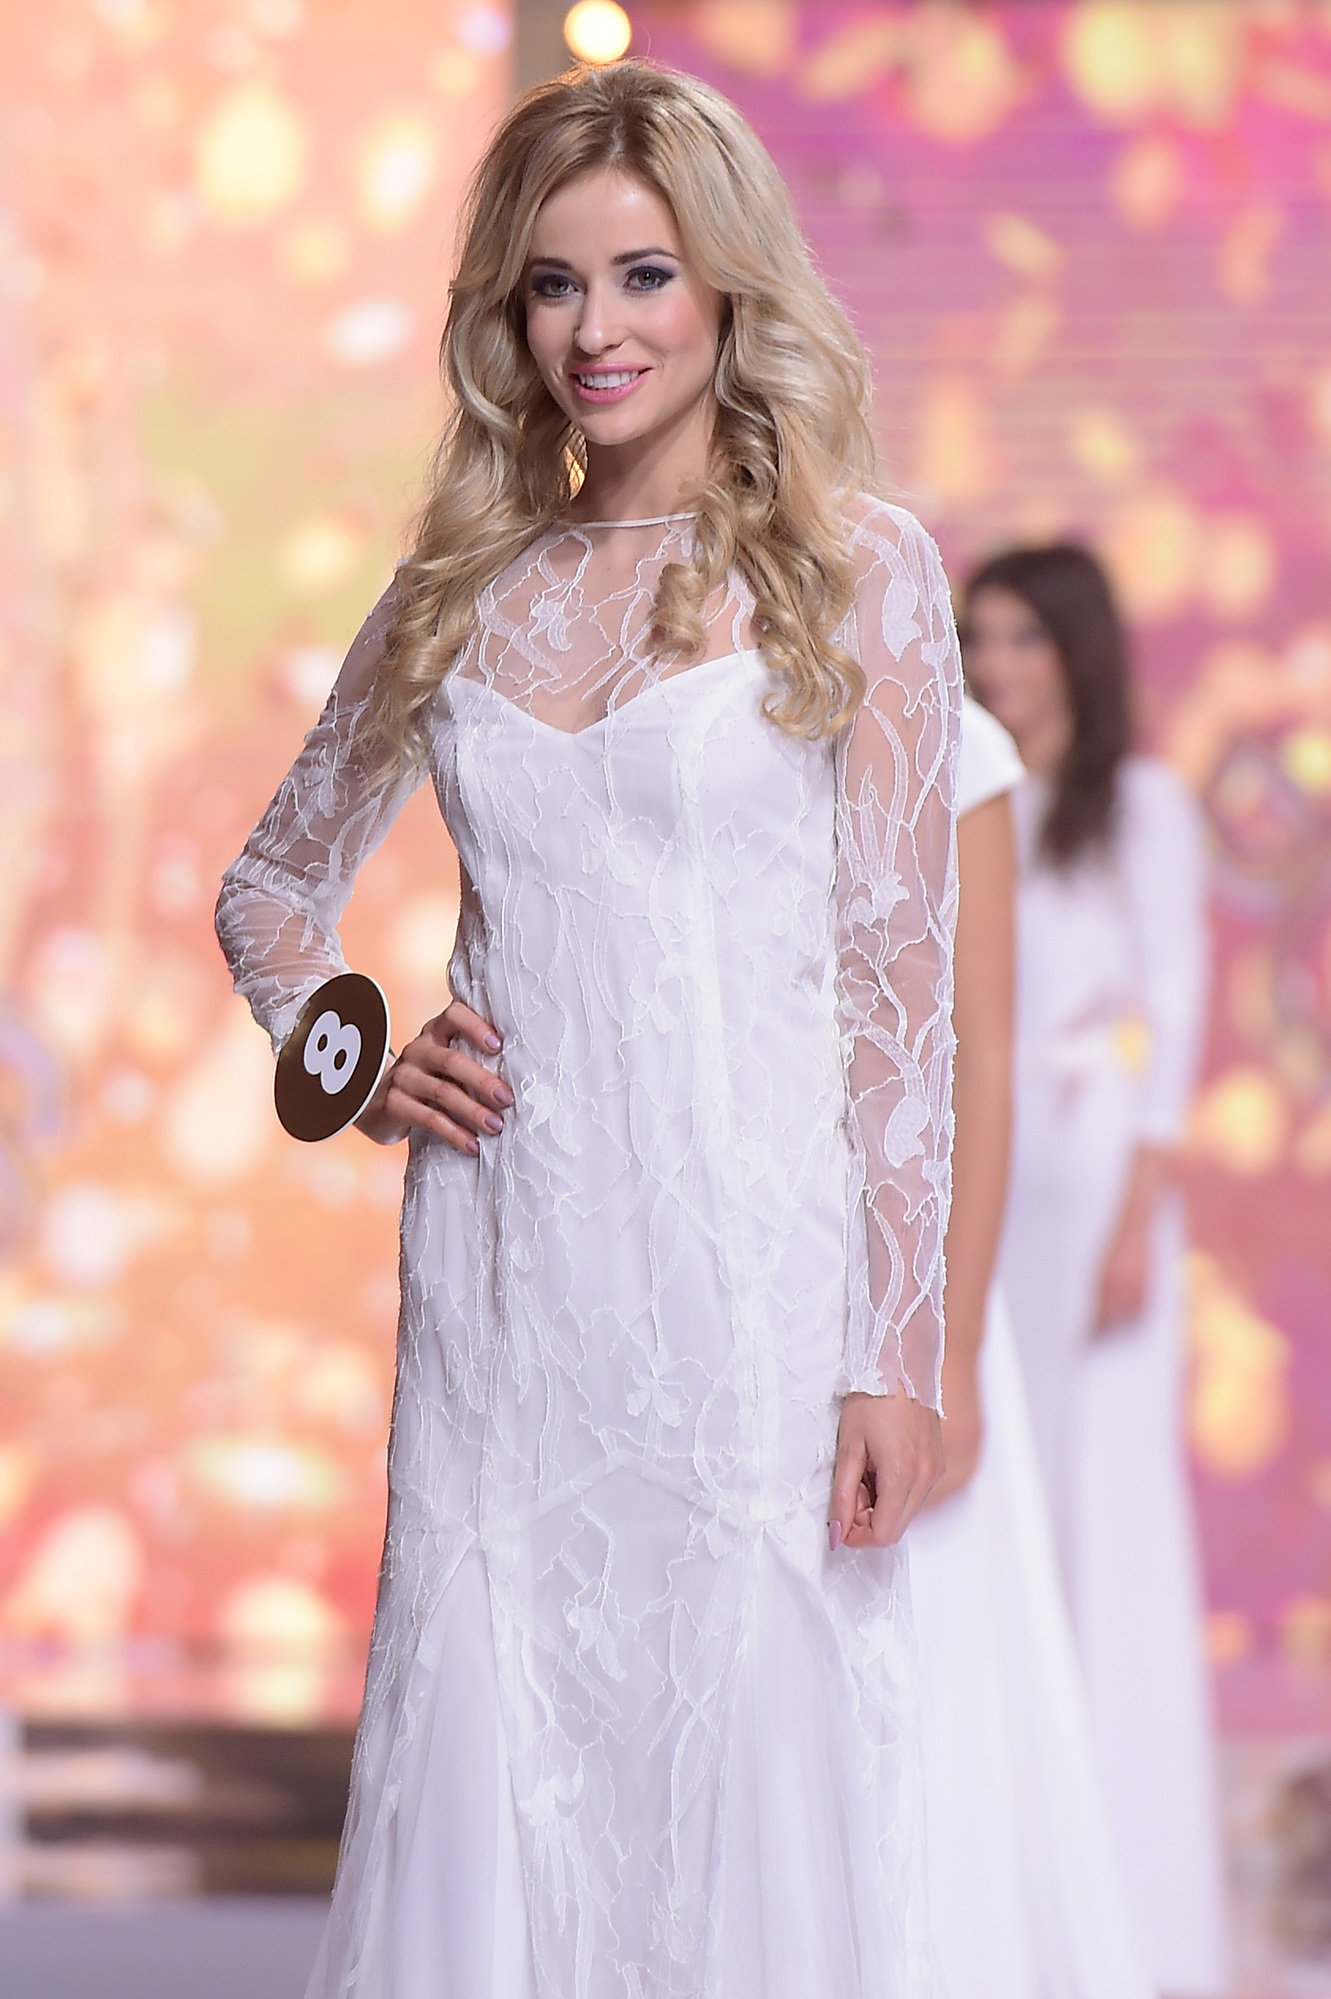 Była uczestniczka Top Model reprezentuje Polskę na Miss Universe 2018!